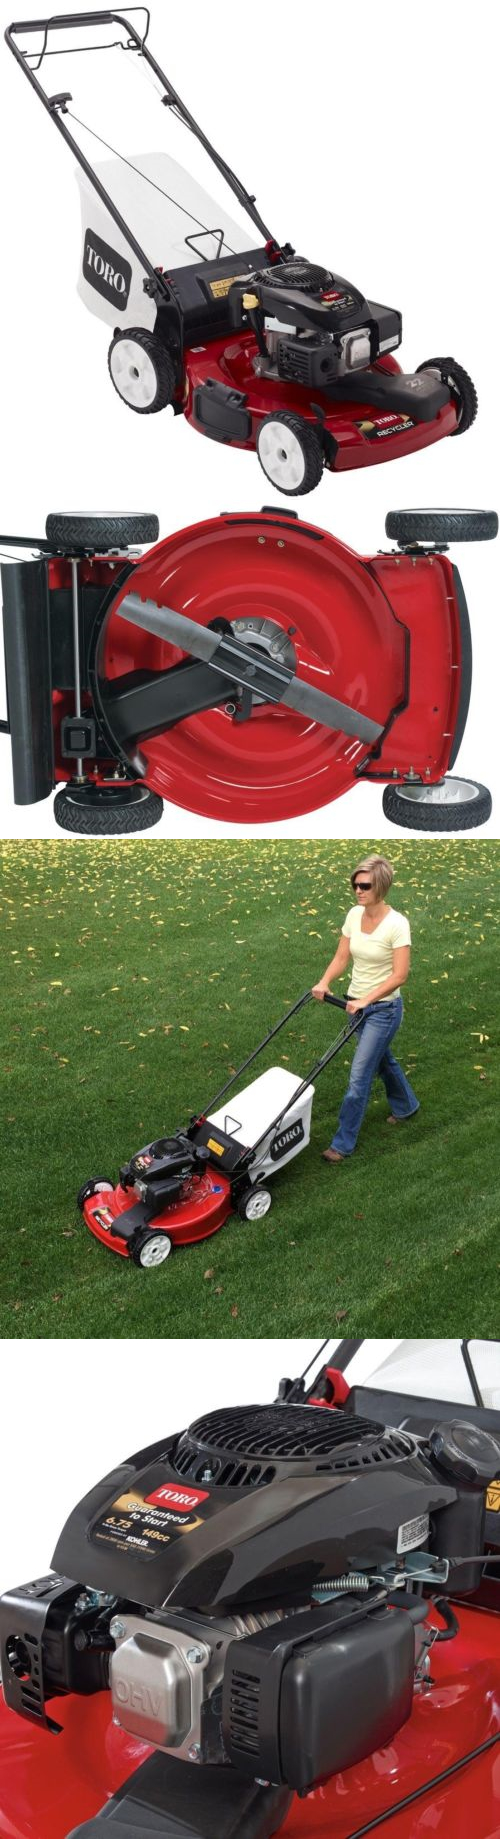 Walk-Behind Mowers 71272: Lawn Mower Grass Cutter Front Wheel Drive ...